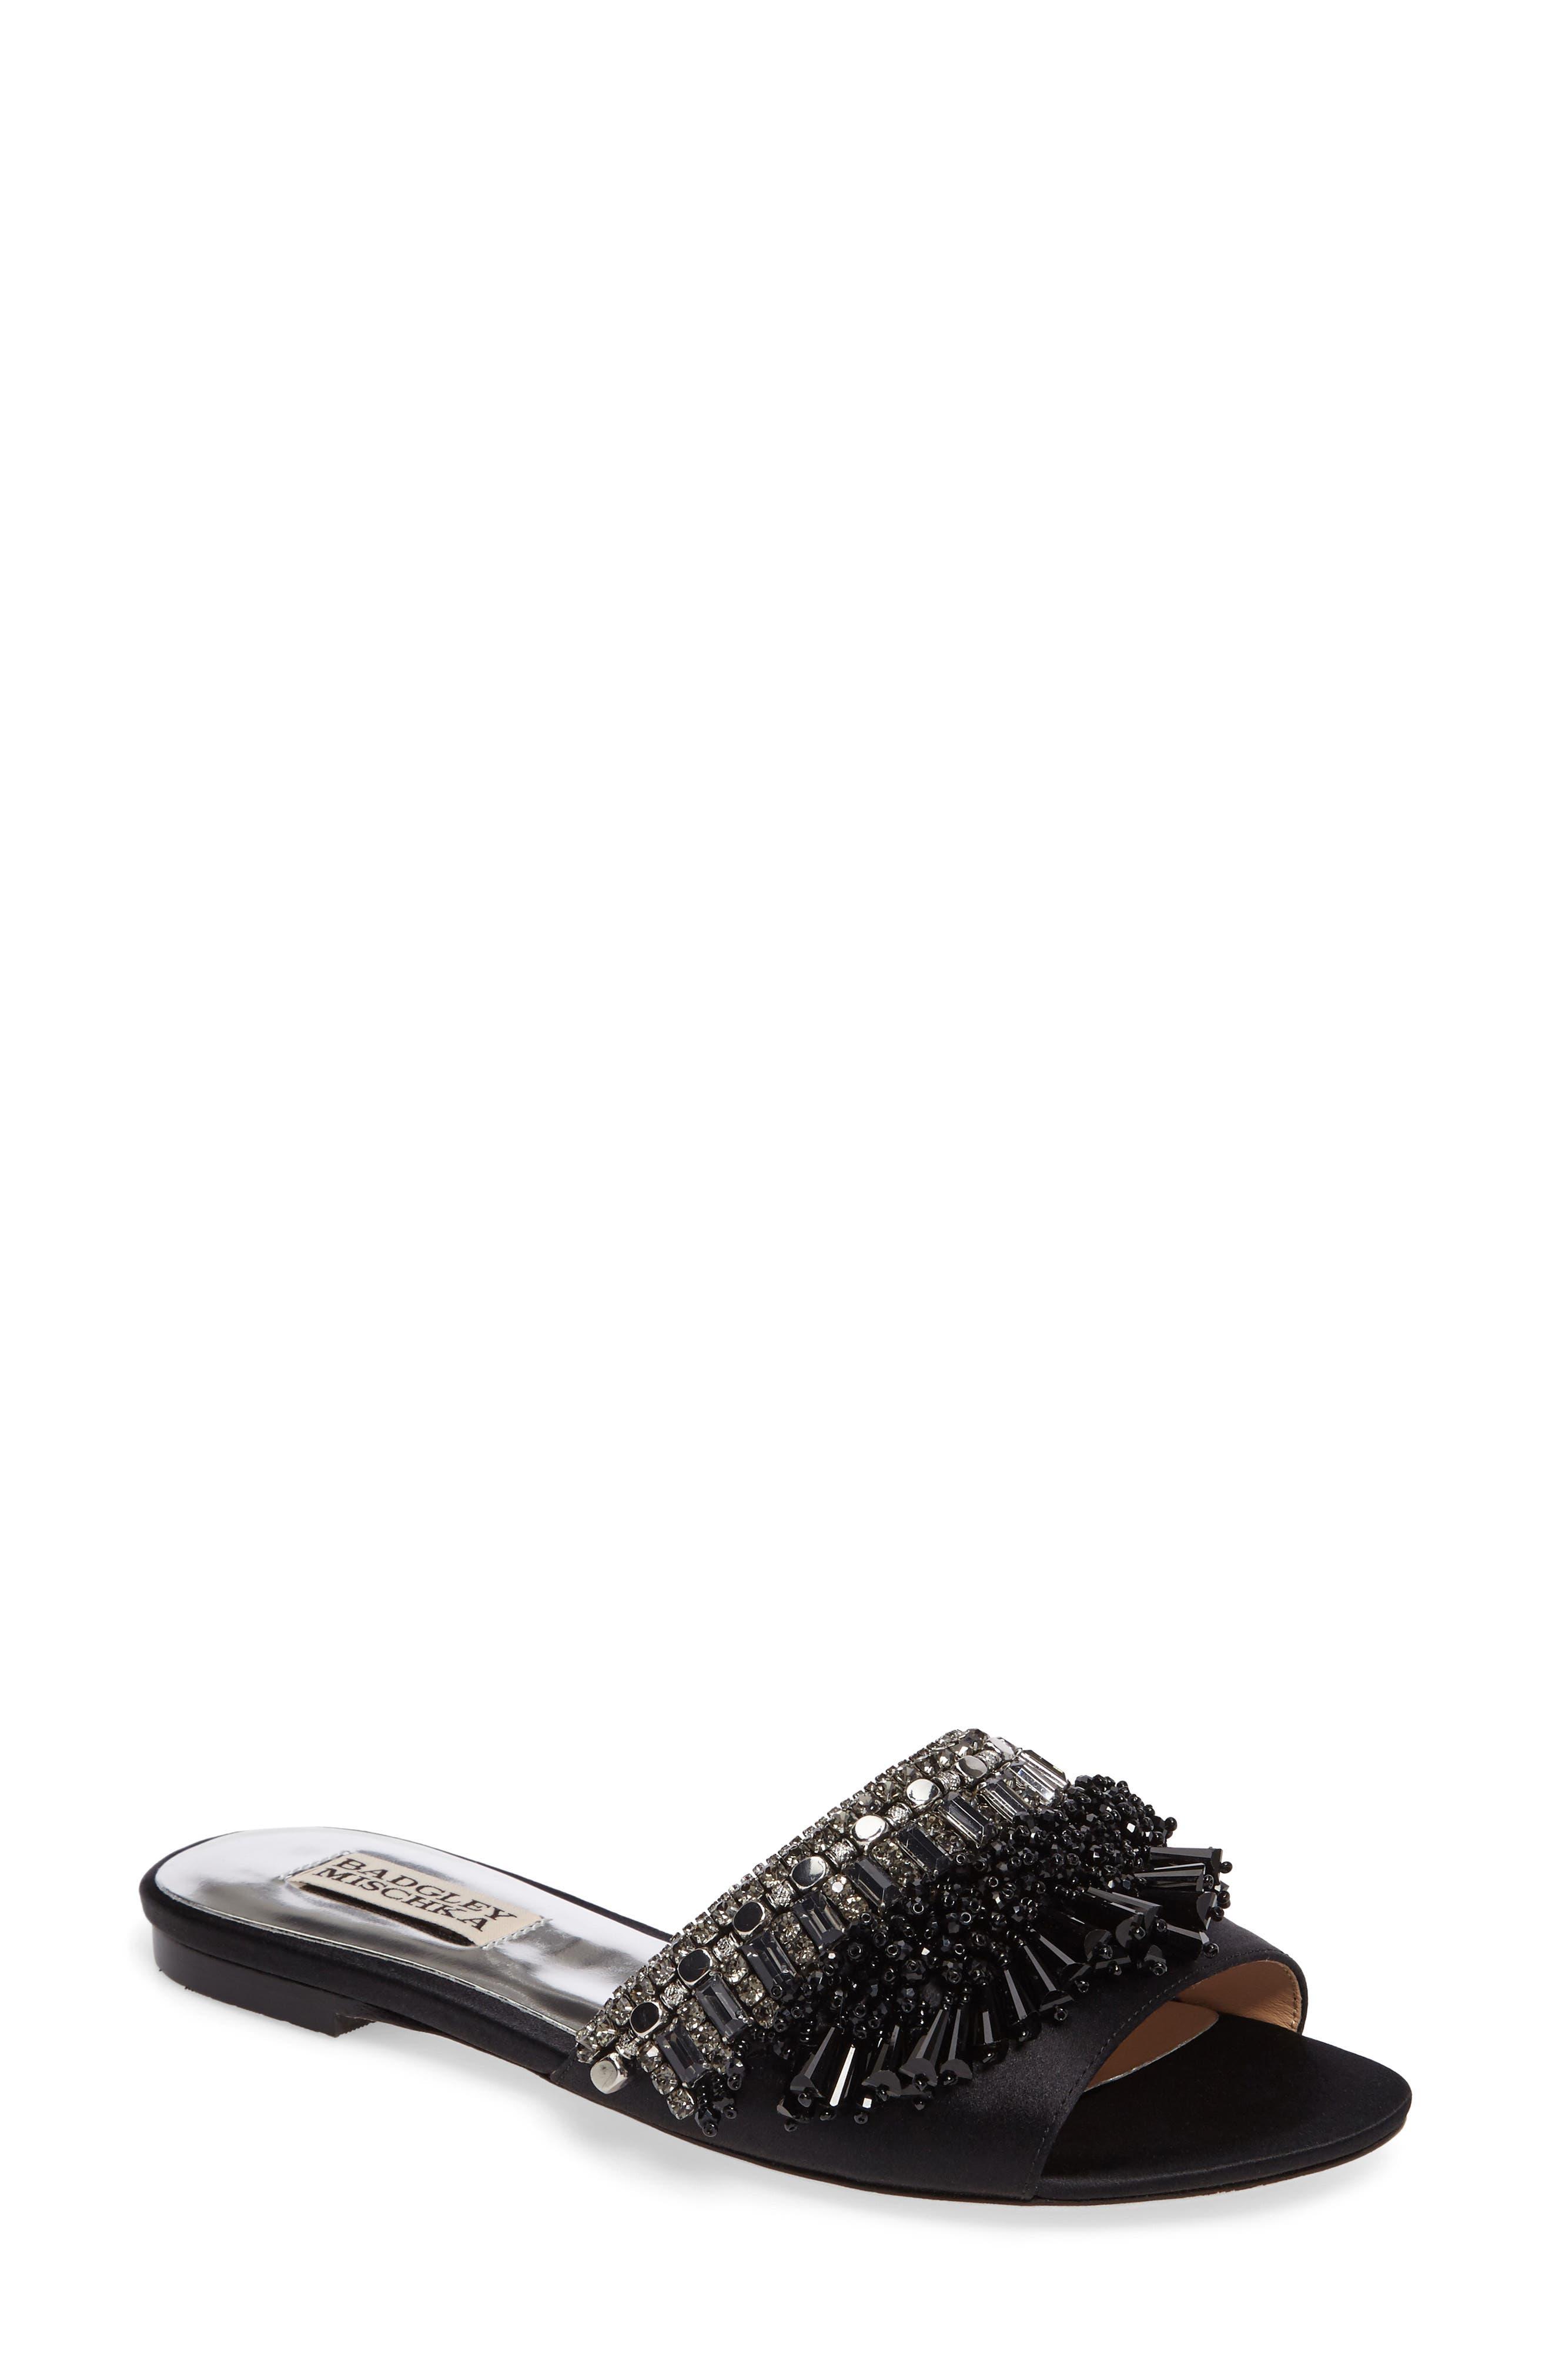 Alternate Image 1 Selected - Badgley Mischka Kassandra Embellished Slide Sandal (Women)